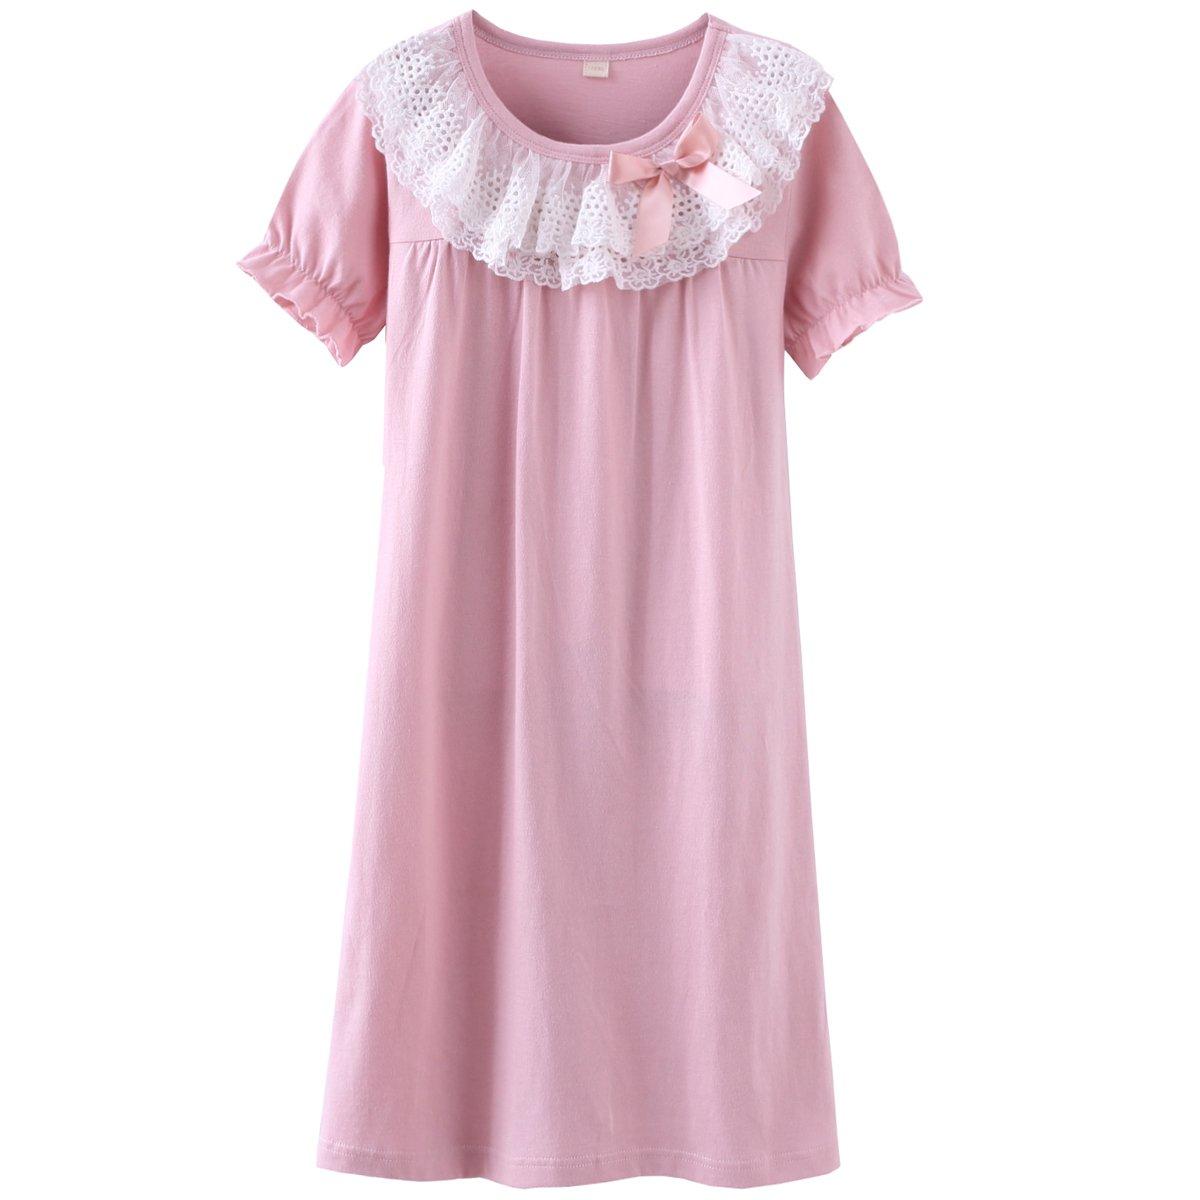 DGAGA Little Girls Princess Nightgown Cotton Lace Bowknot Sleepwear Nightdress DGFB-002